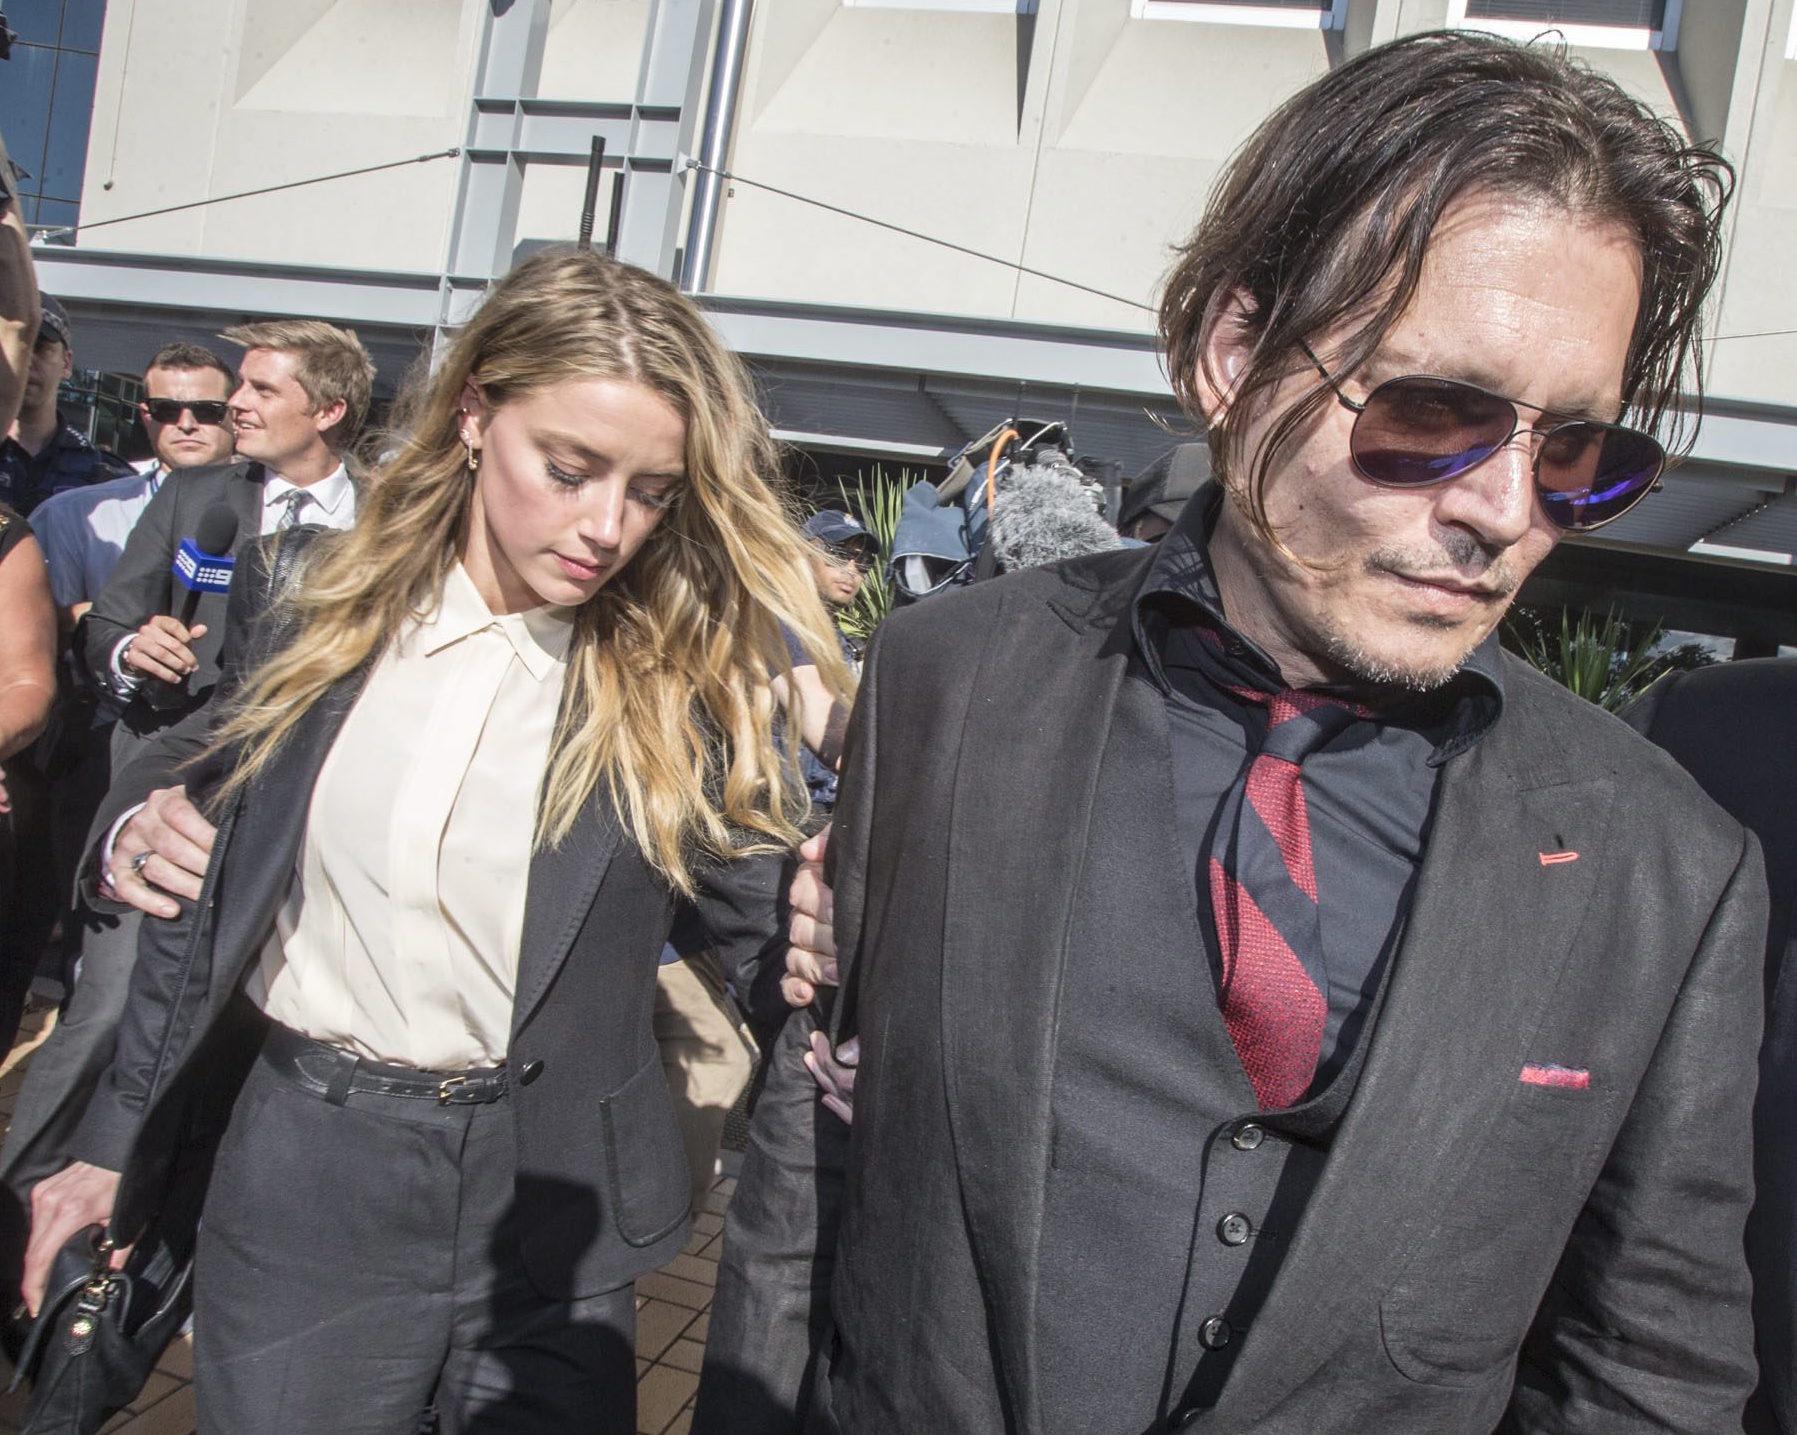 Johnny Depp's $50M Lawsuit Against Amber Heard Should Be Tossed, She Says –  Deadline